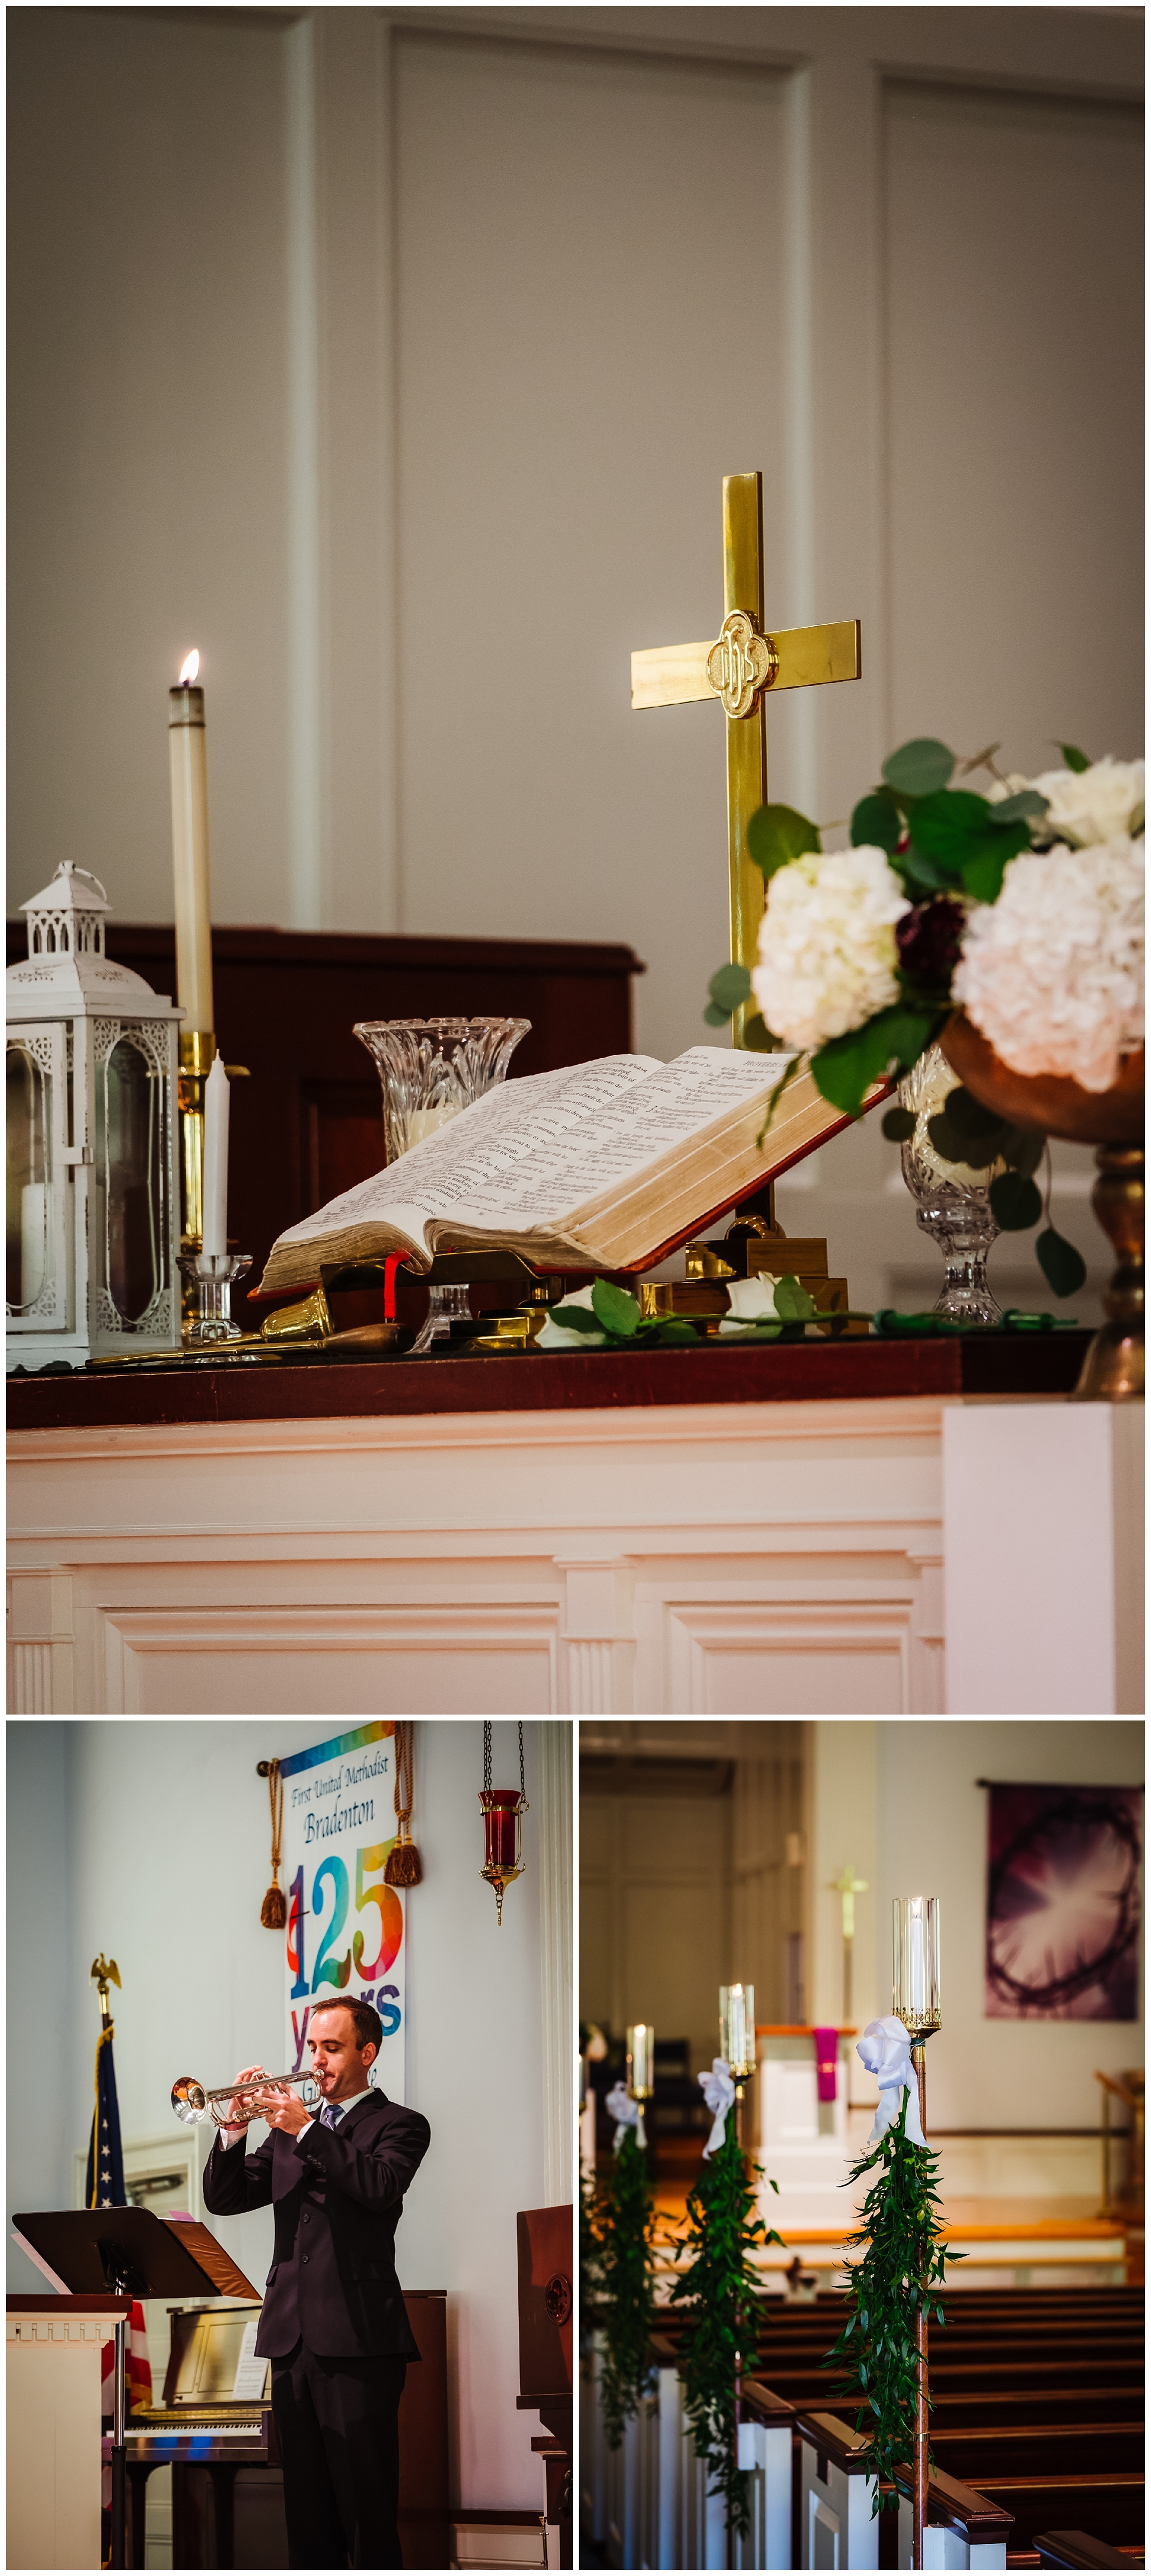 tampa-bradenton-wedding-photographer-south-florida-museum-classic-blush-gold-alpacas-sparklers_0042.jpg